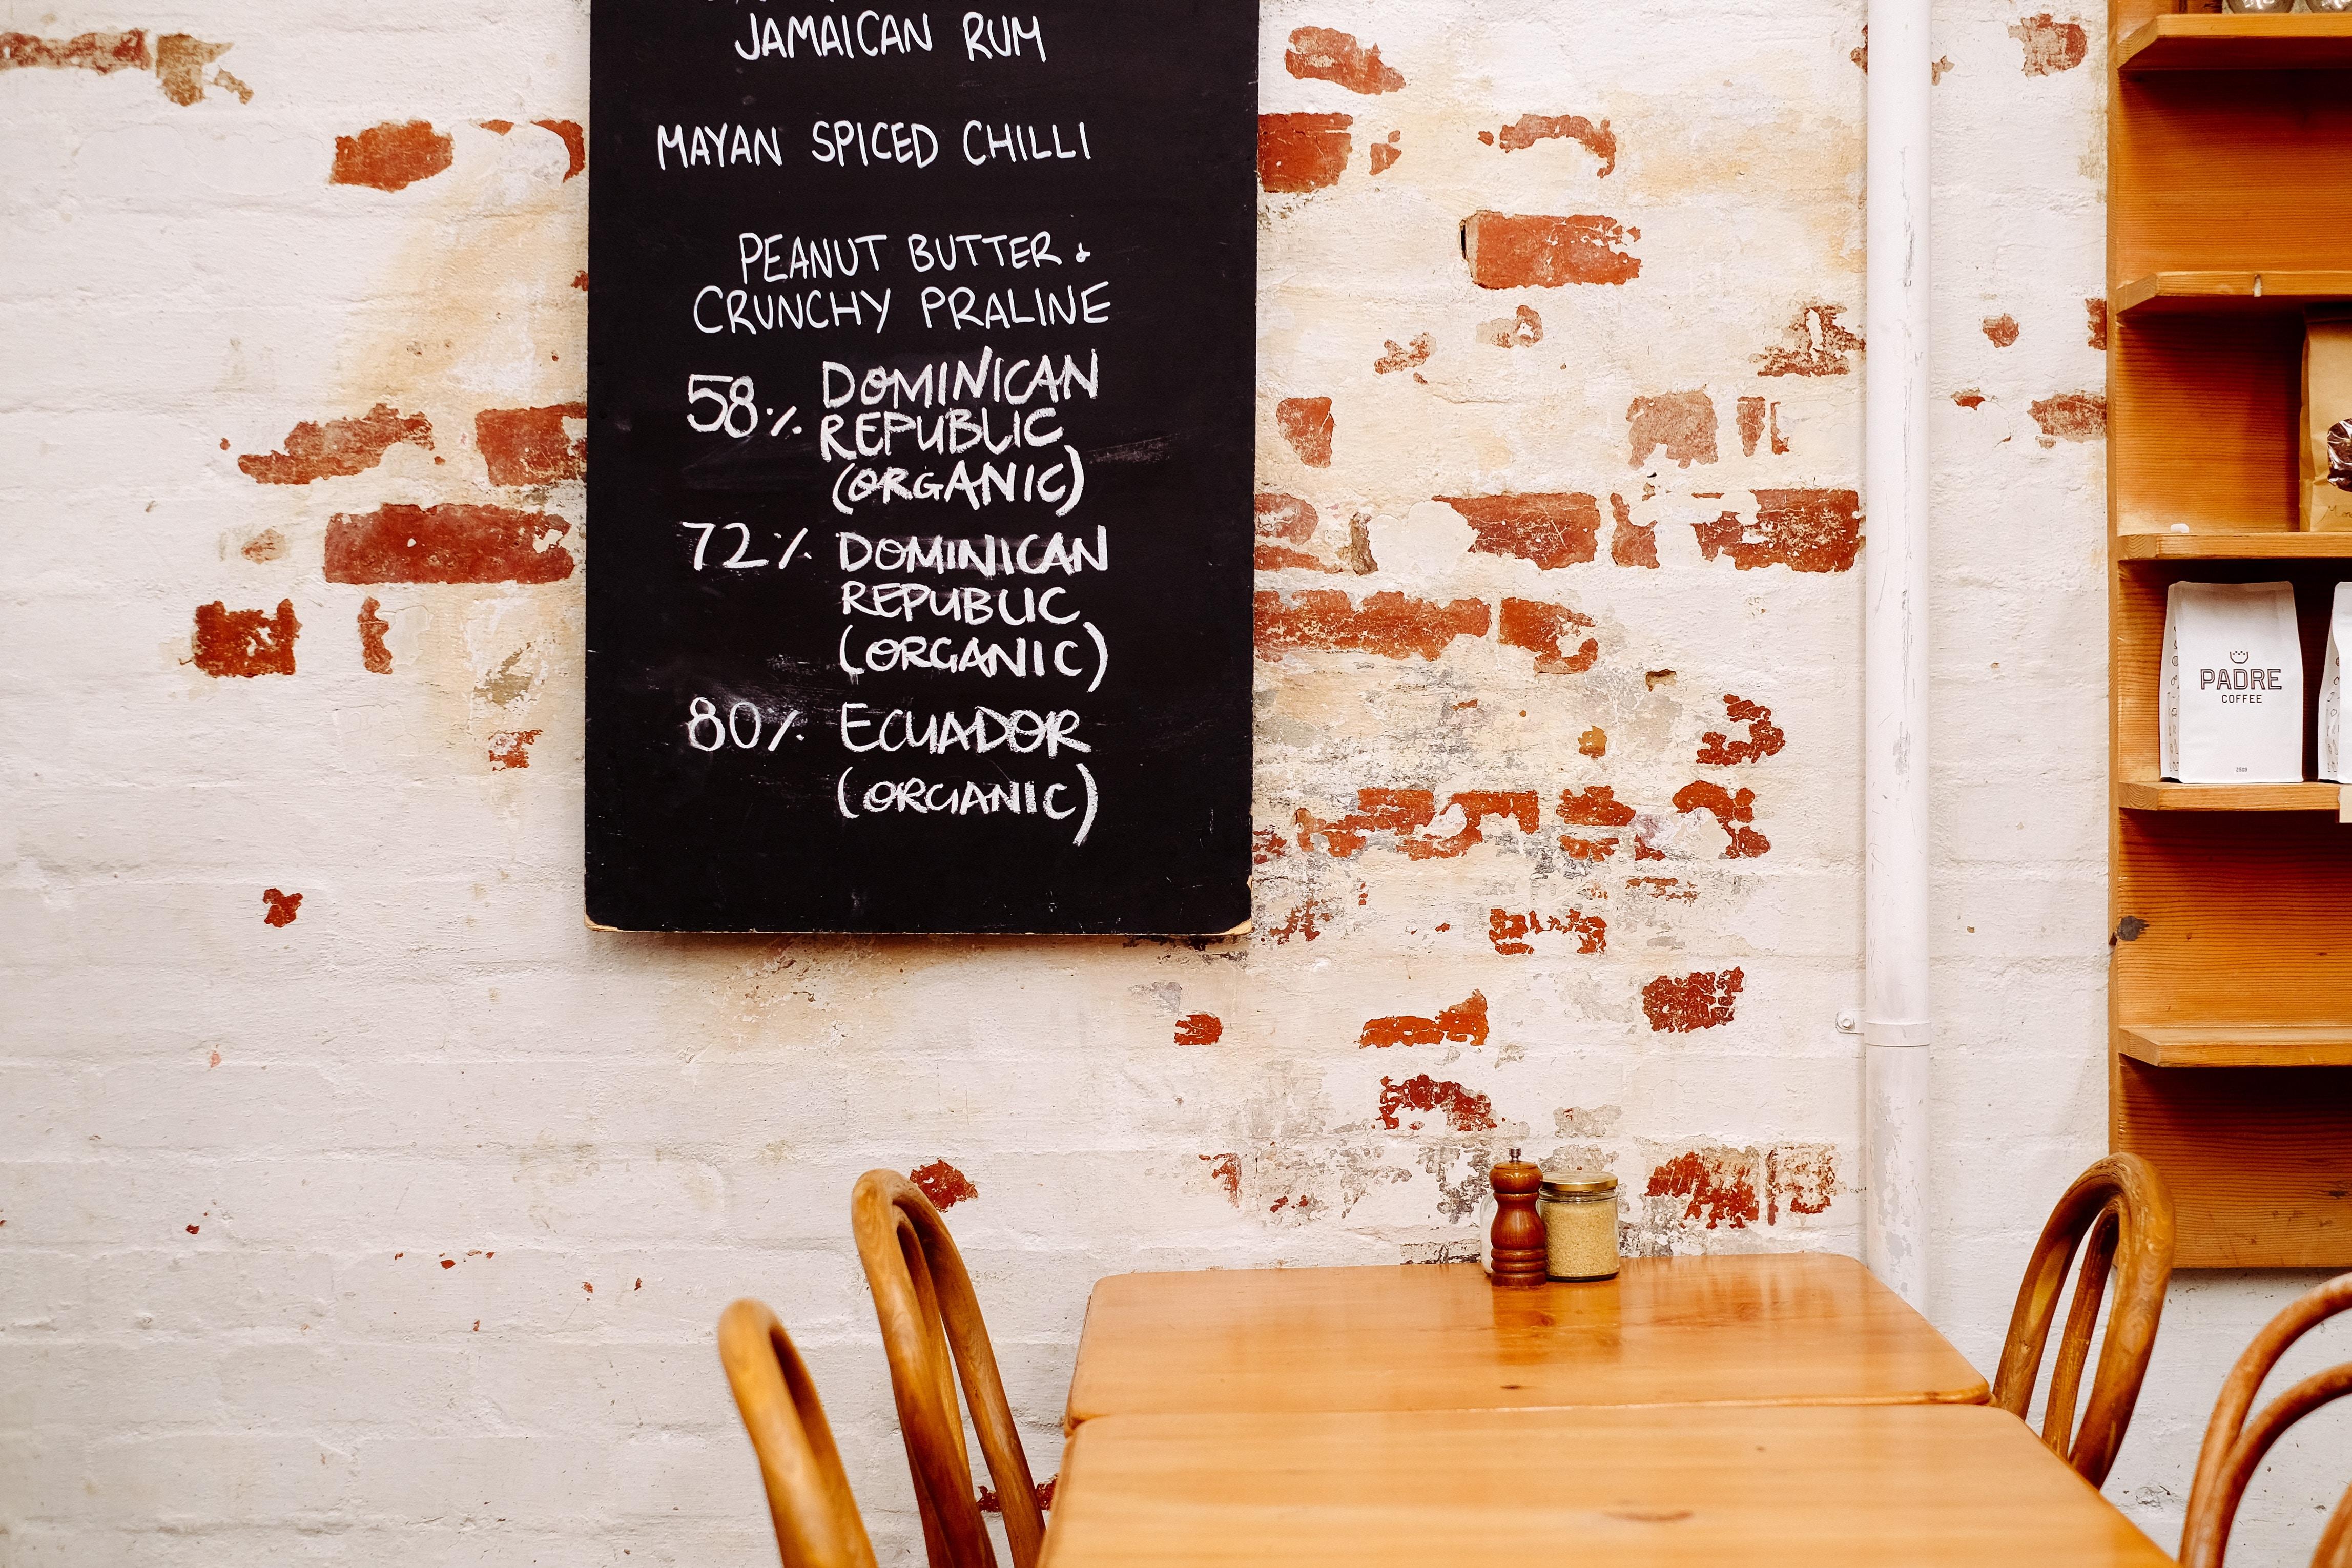 black menu on wall